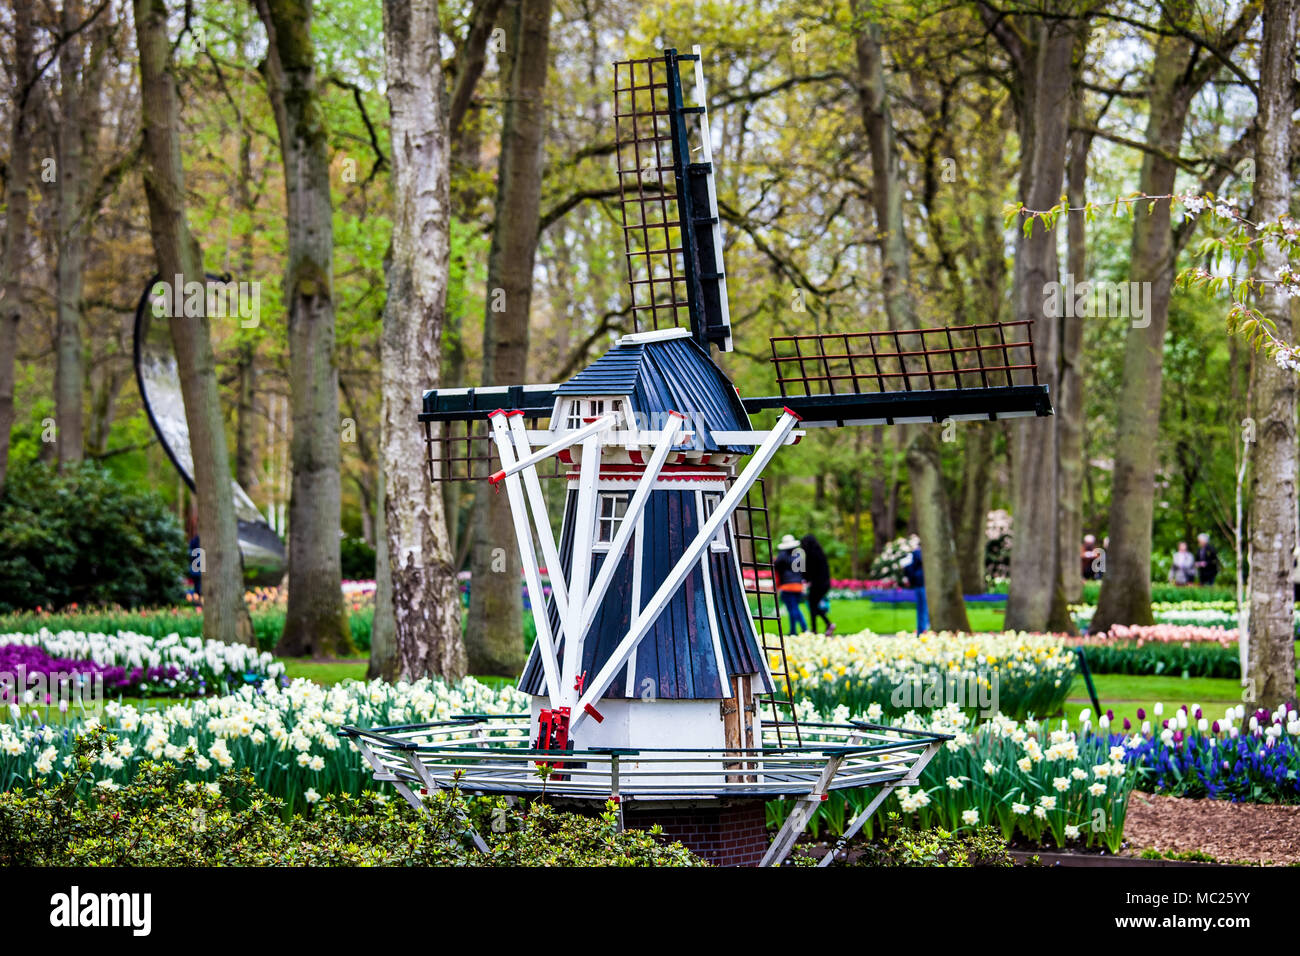 Decorative Windmill Stock Photos & Decorative Windmill Stock Images ...